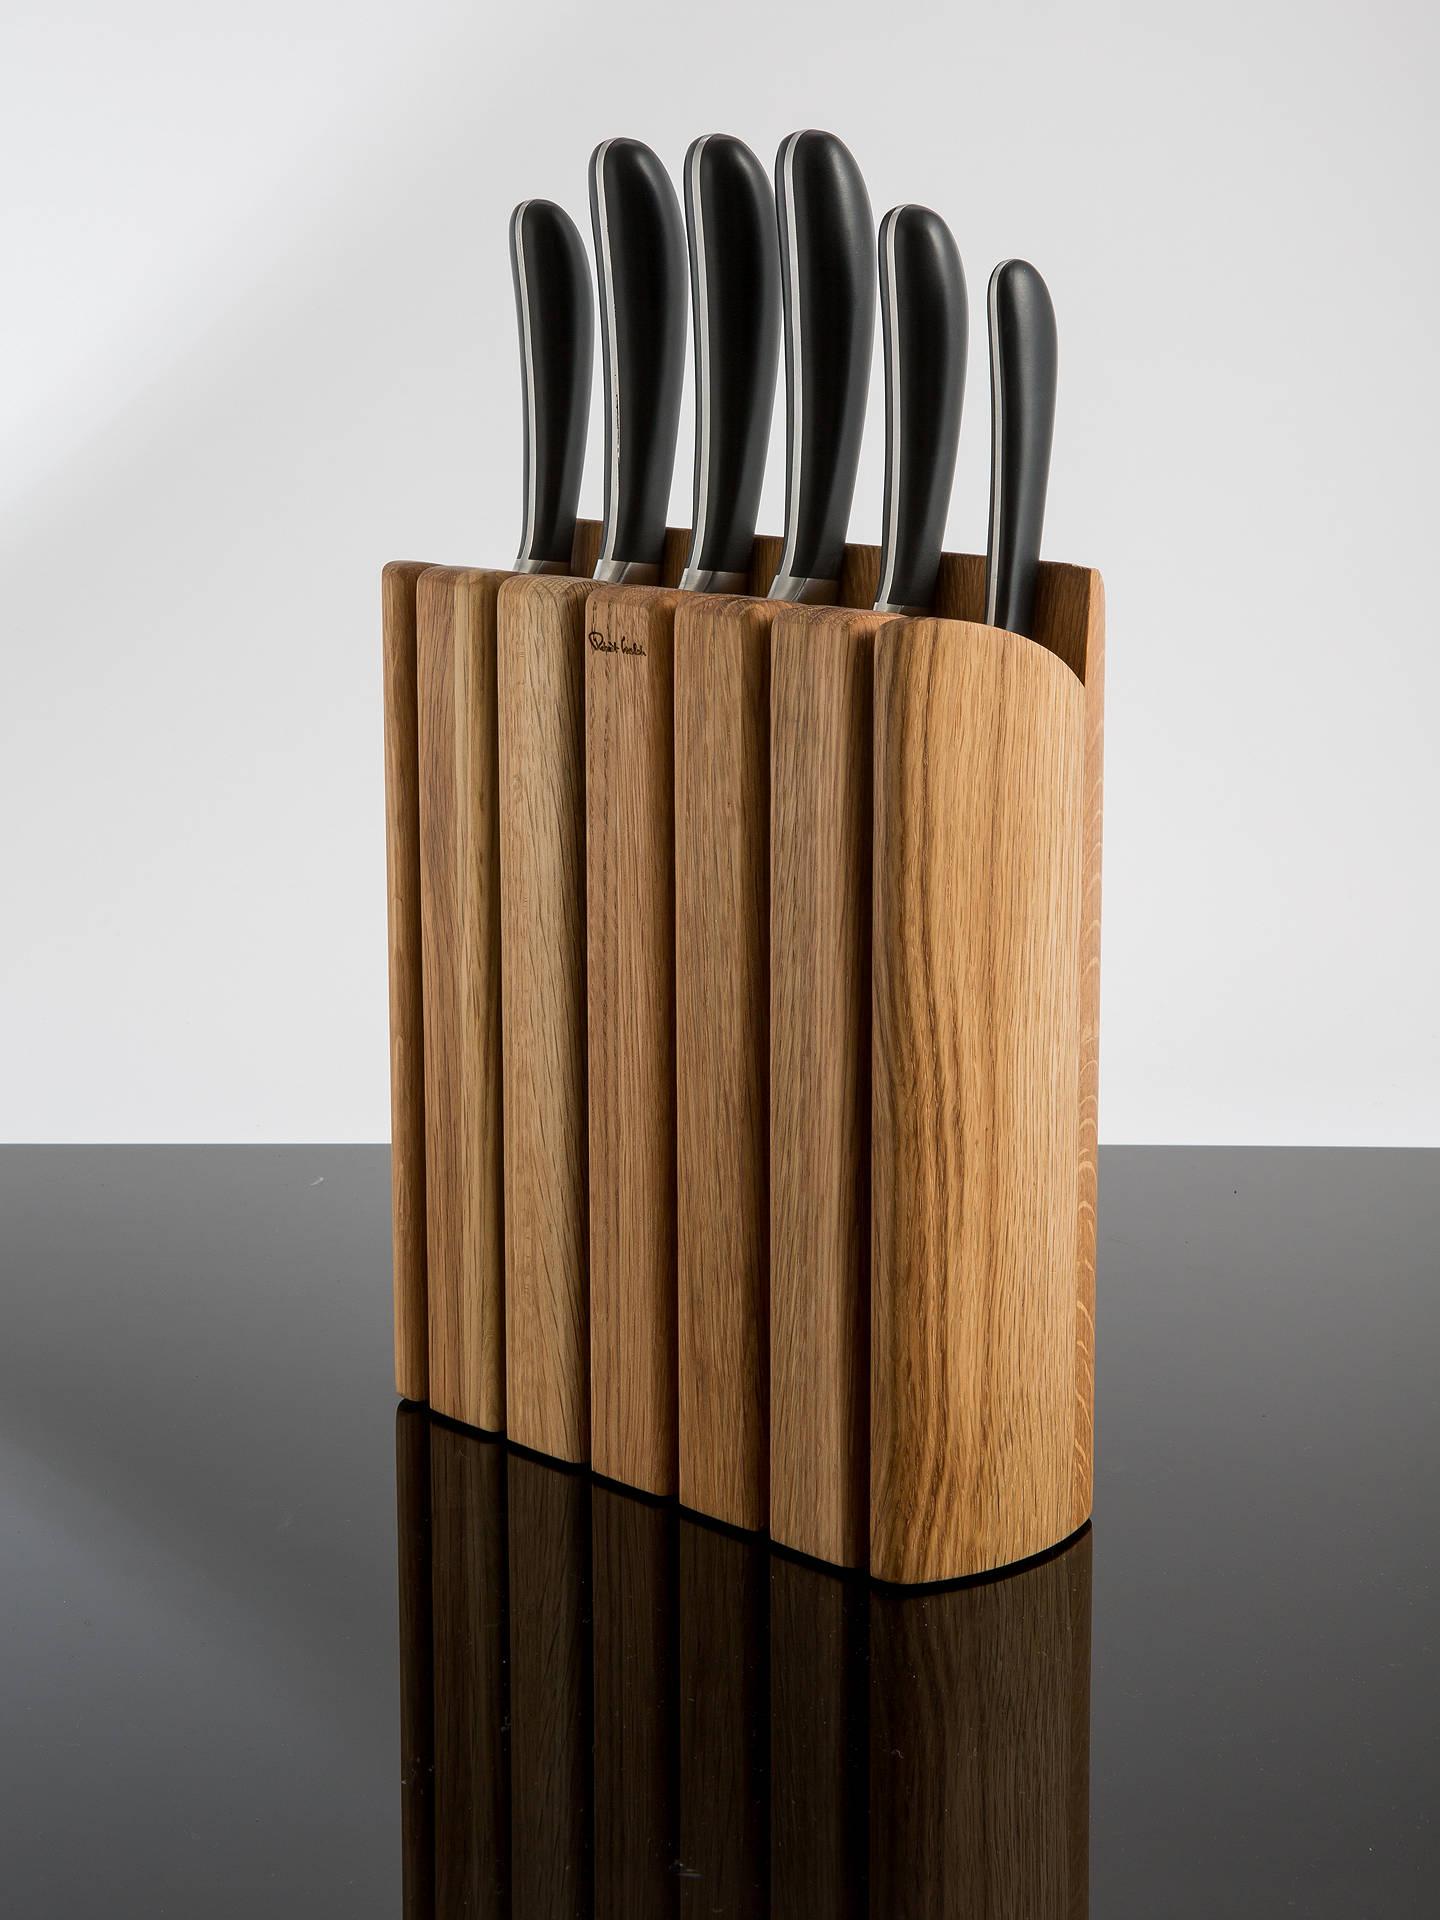 welch kitchen knives robert welch signature book oak wood filled knife block